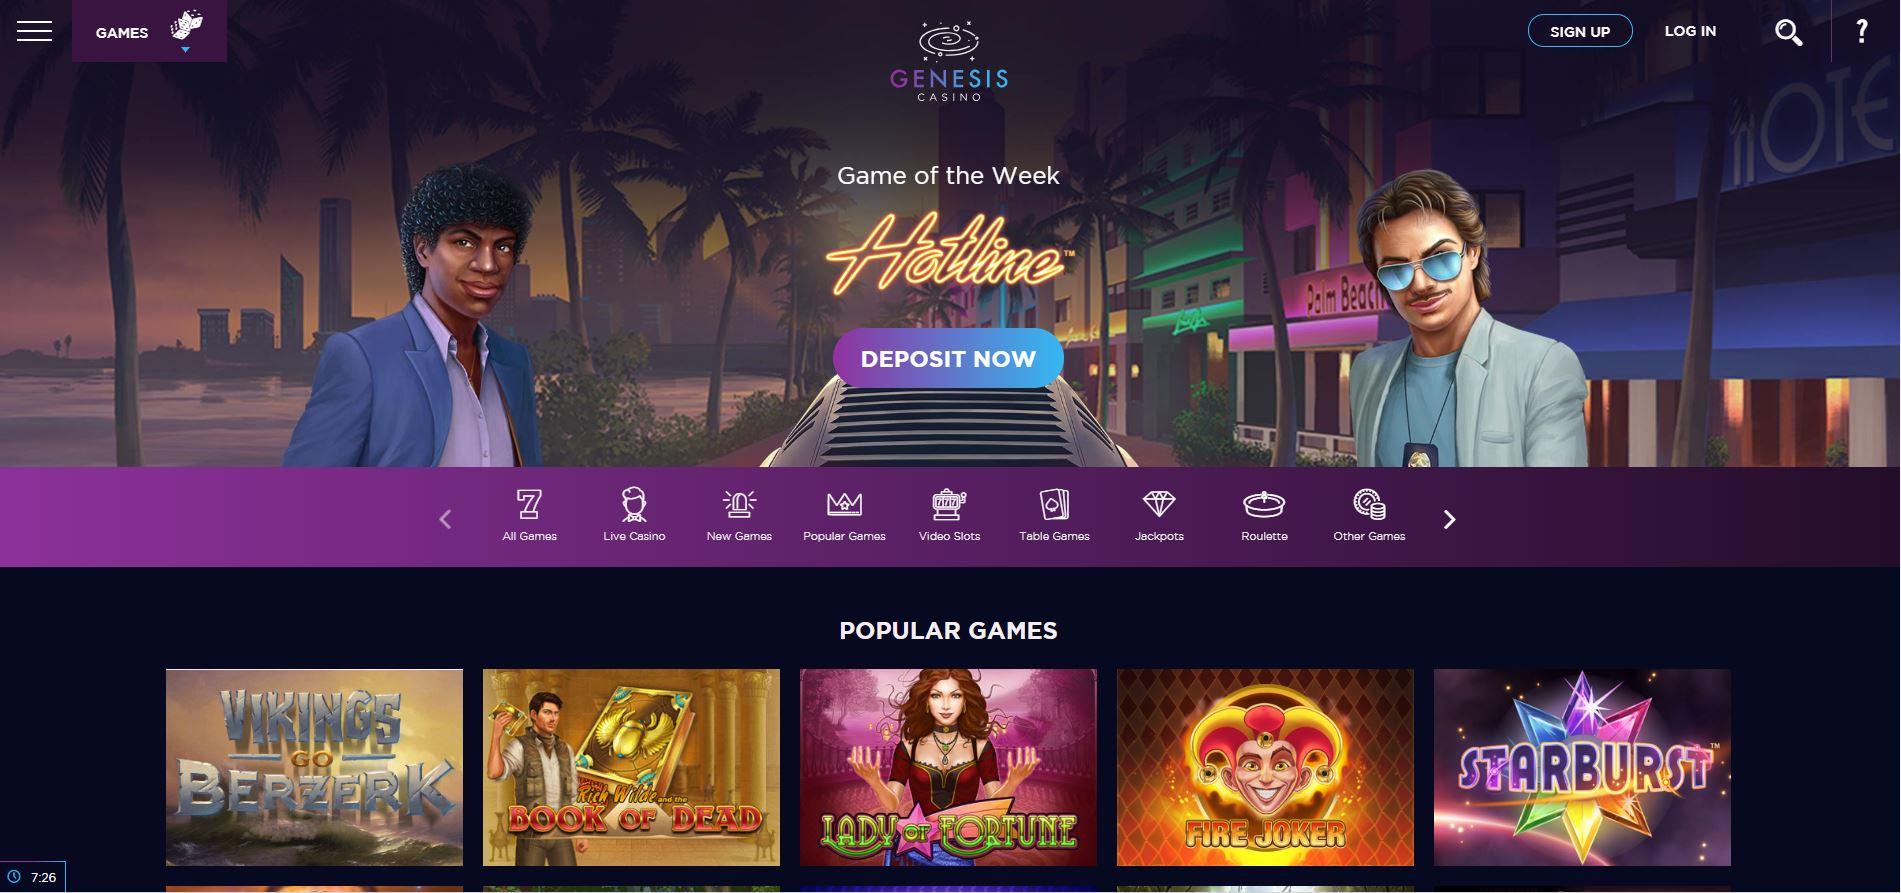 Genesis casino spelaanbod